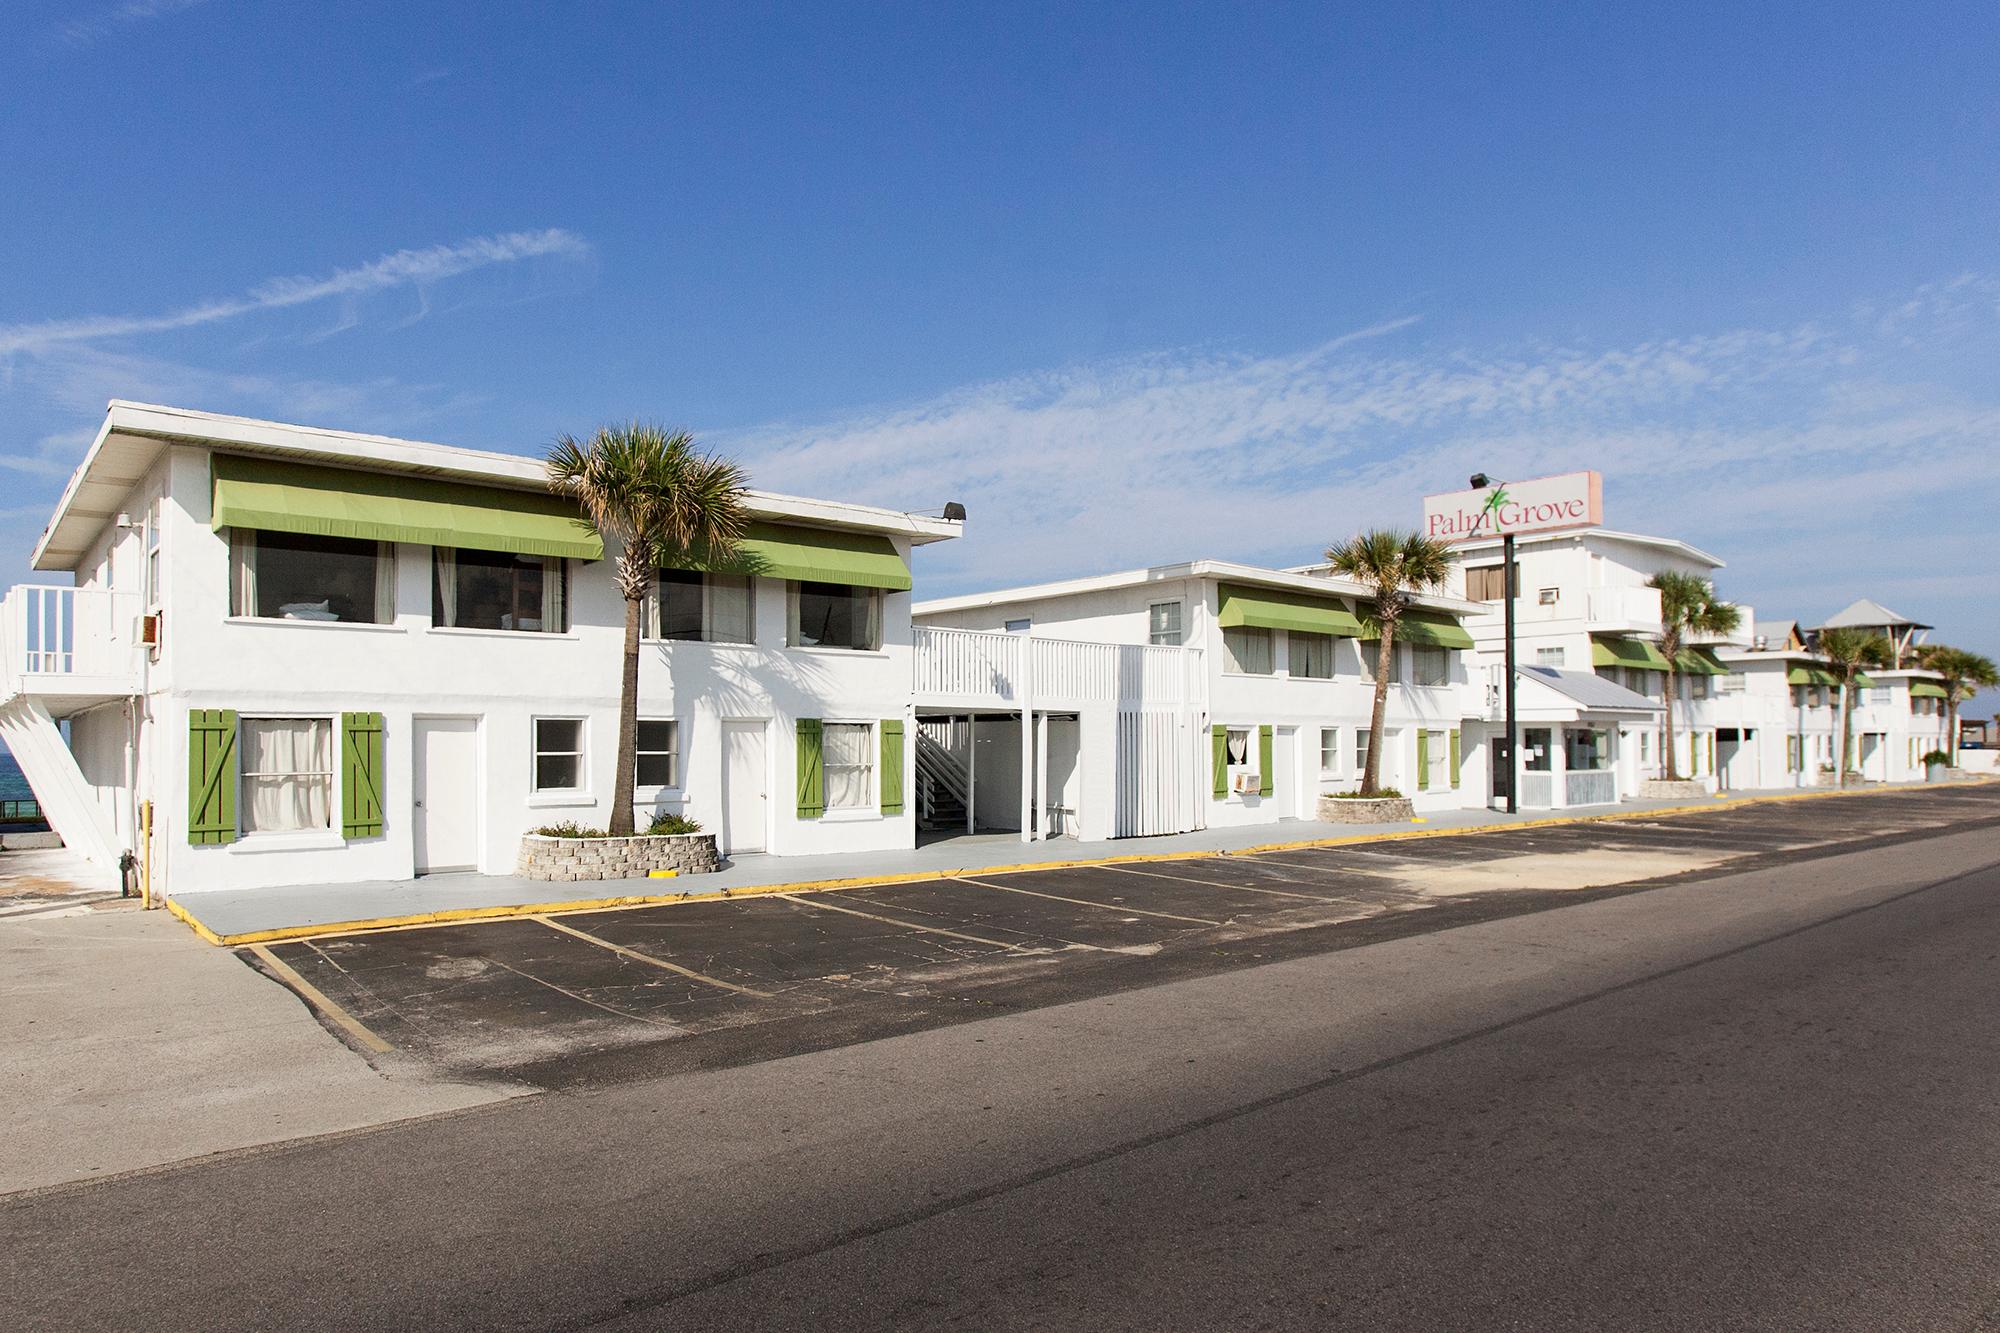 The Palm Grove Panama City Beach